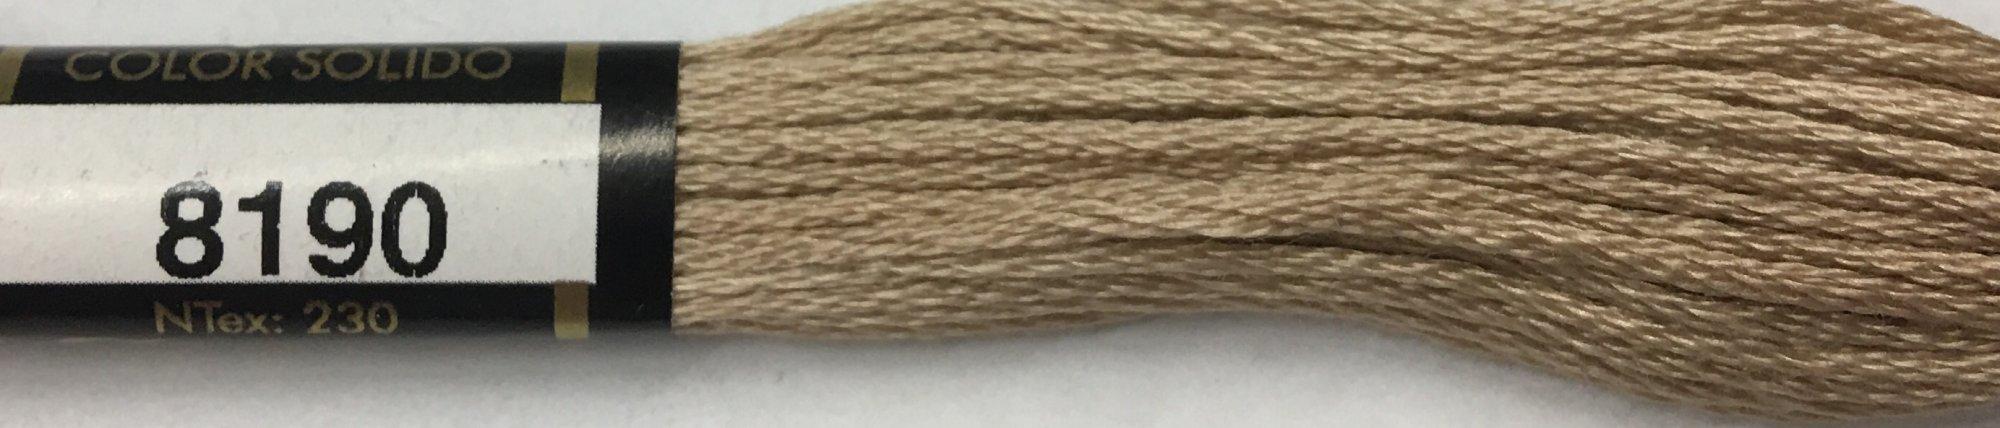 F8190 Presencia 100% Mercerized Finca Cotton 6 ply Embroidery Floss 8 meter skein